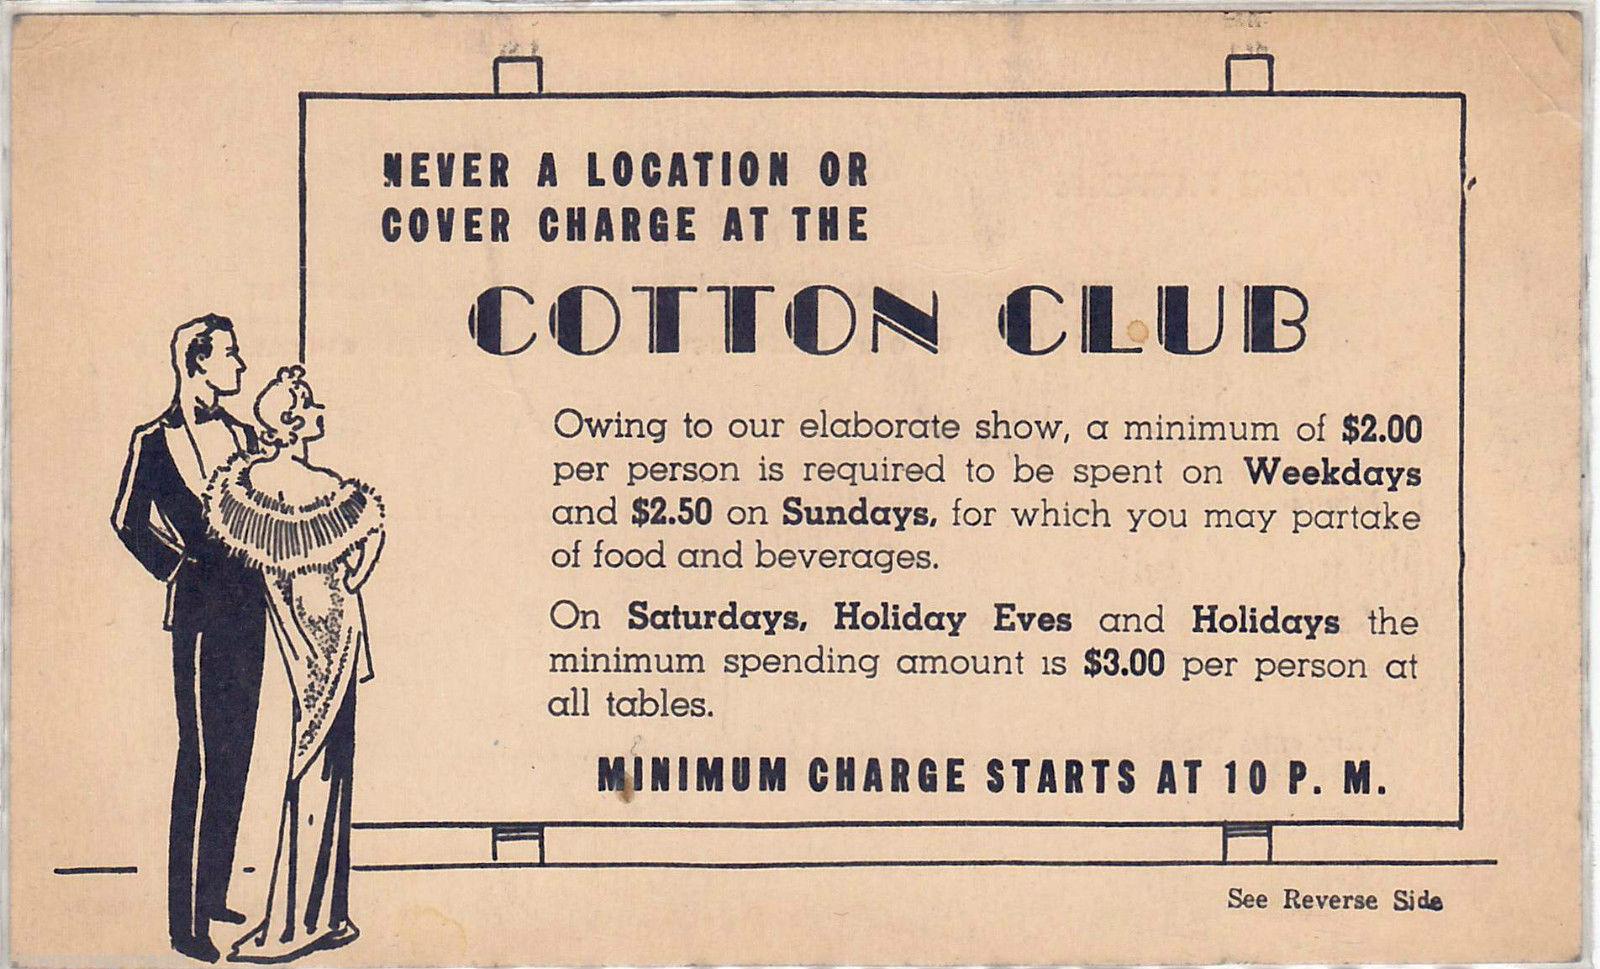 COTTON CLUB front